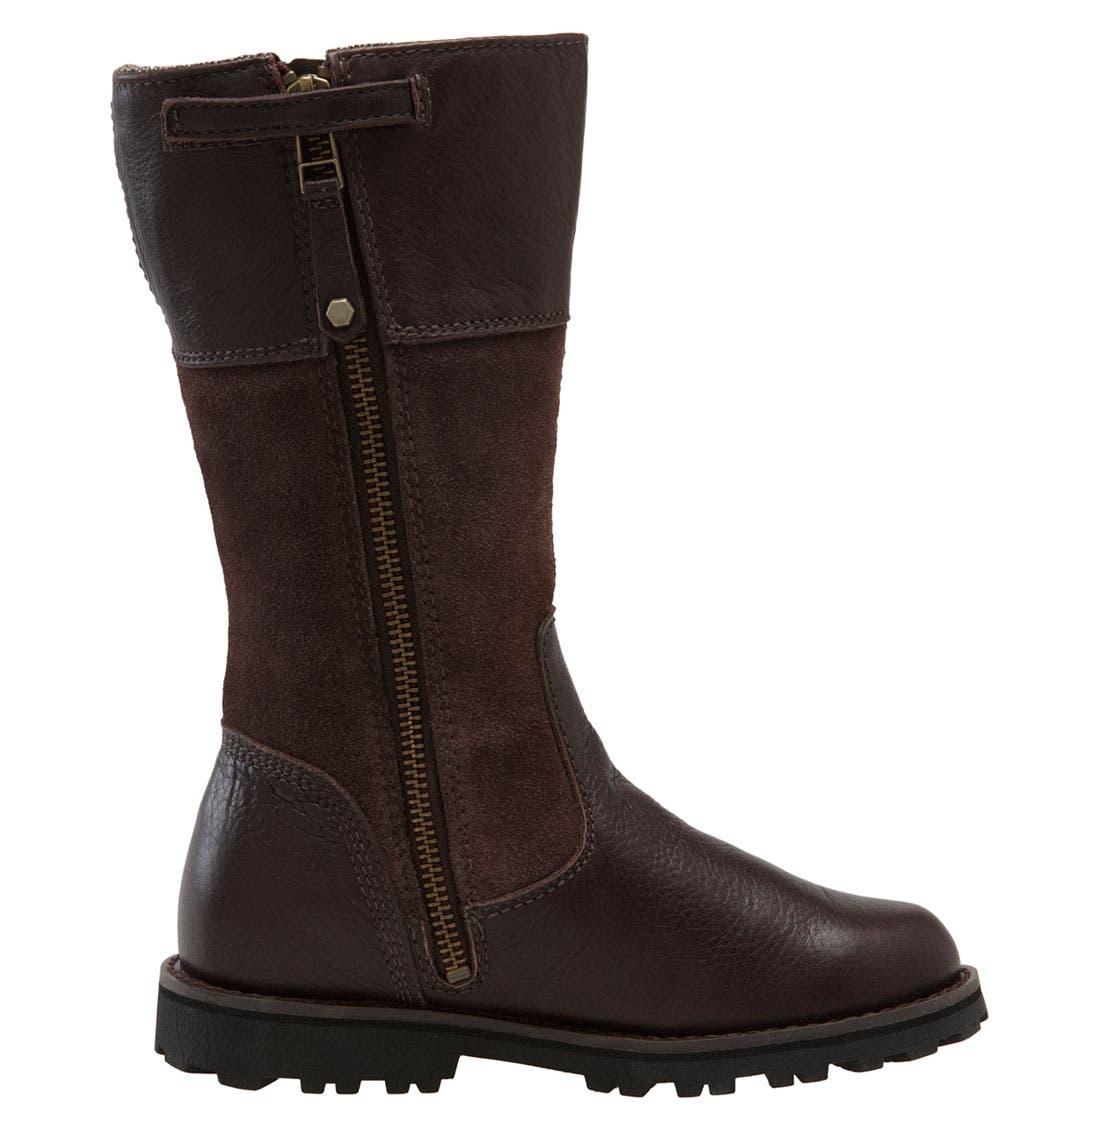 Alternate Image 2  - Timberland 'Maplebrook' Tall Boot (Walker, Toddler, Little Kid & Big Kid)